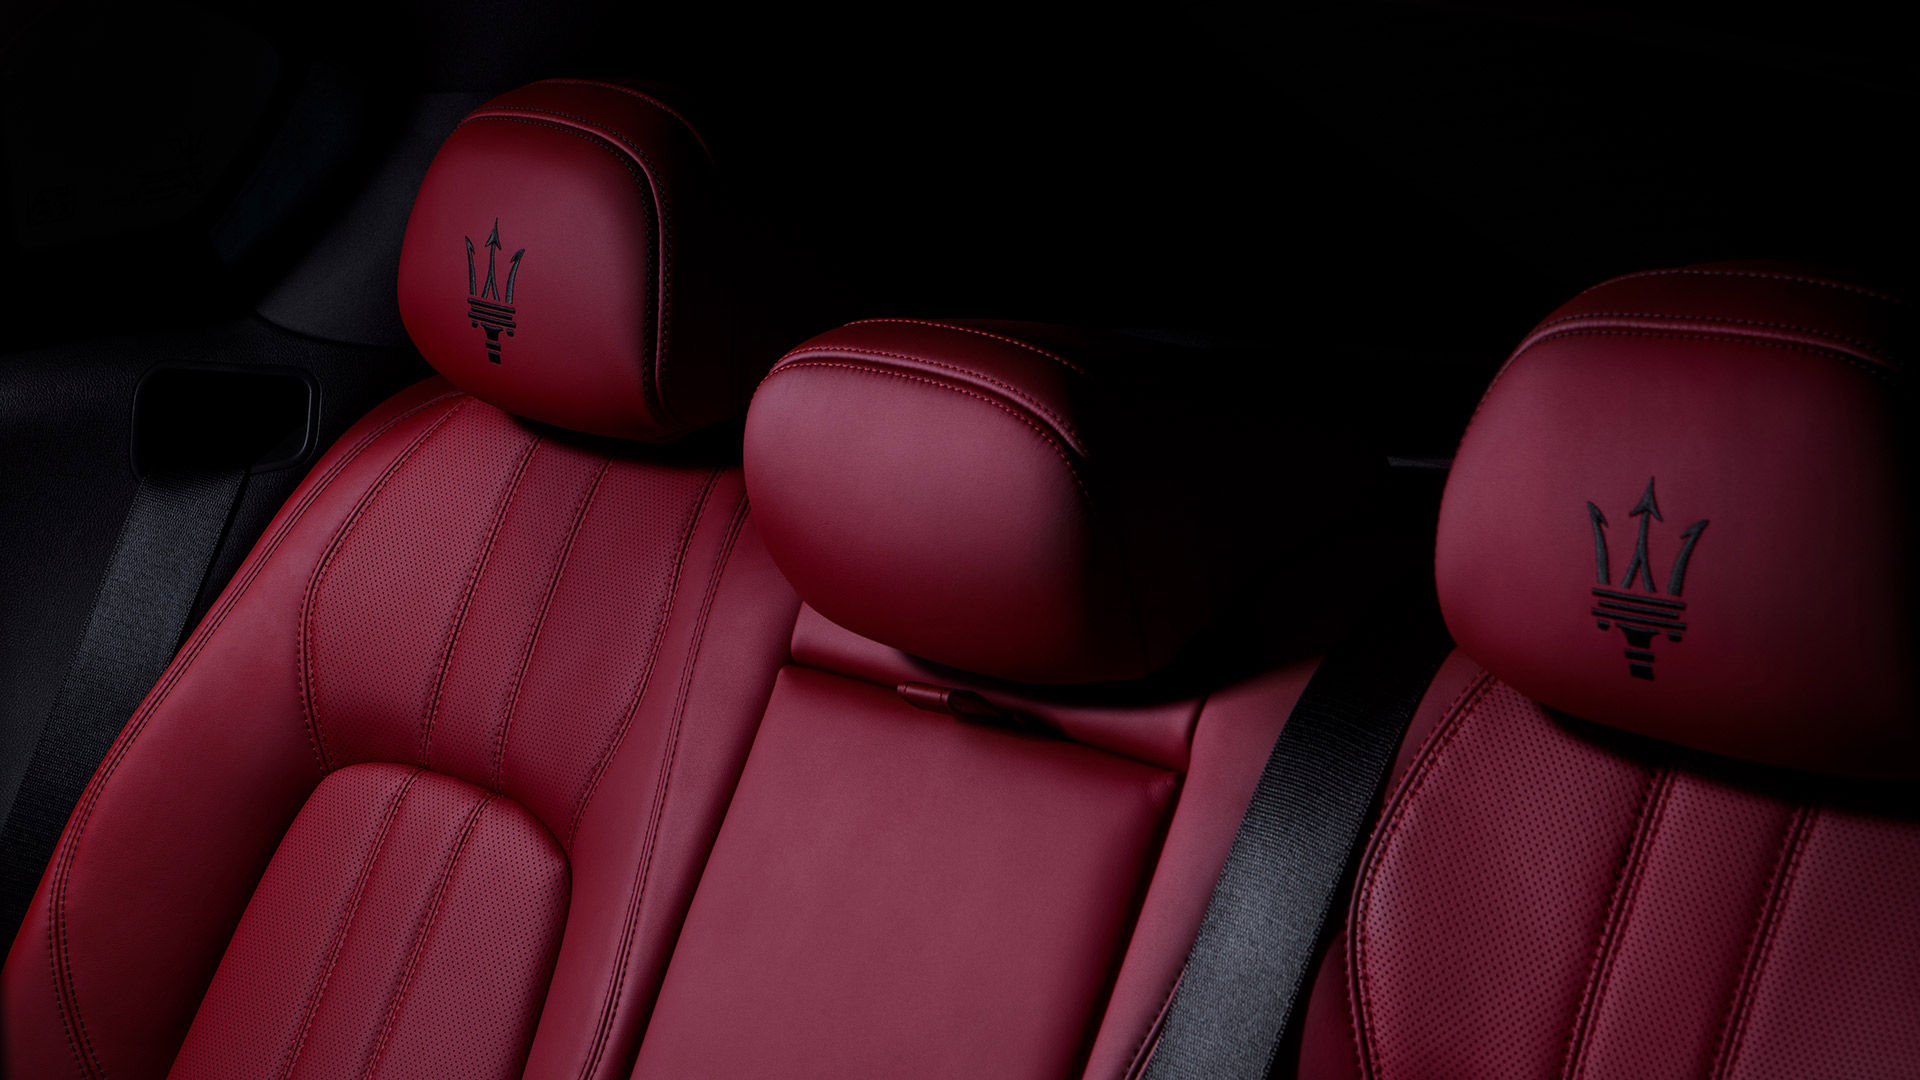 Maserati Levante - Rote Ledersitze - Rücksitzbank